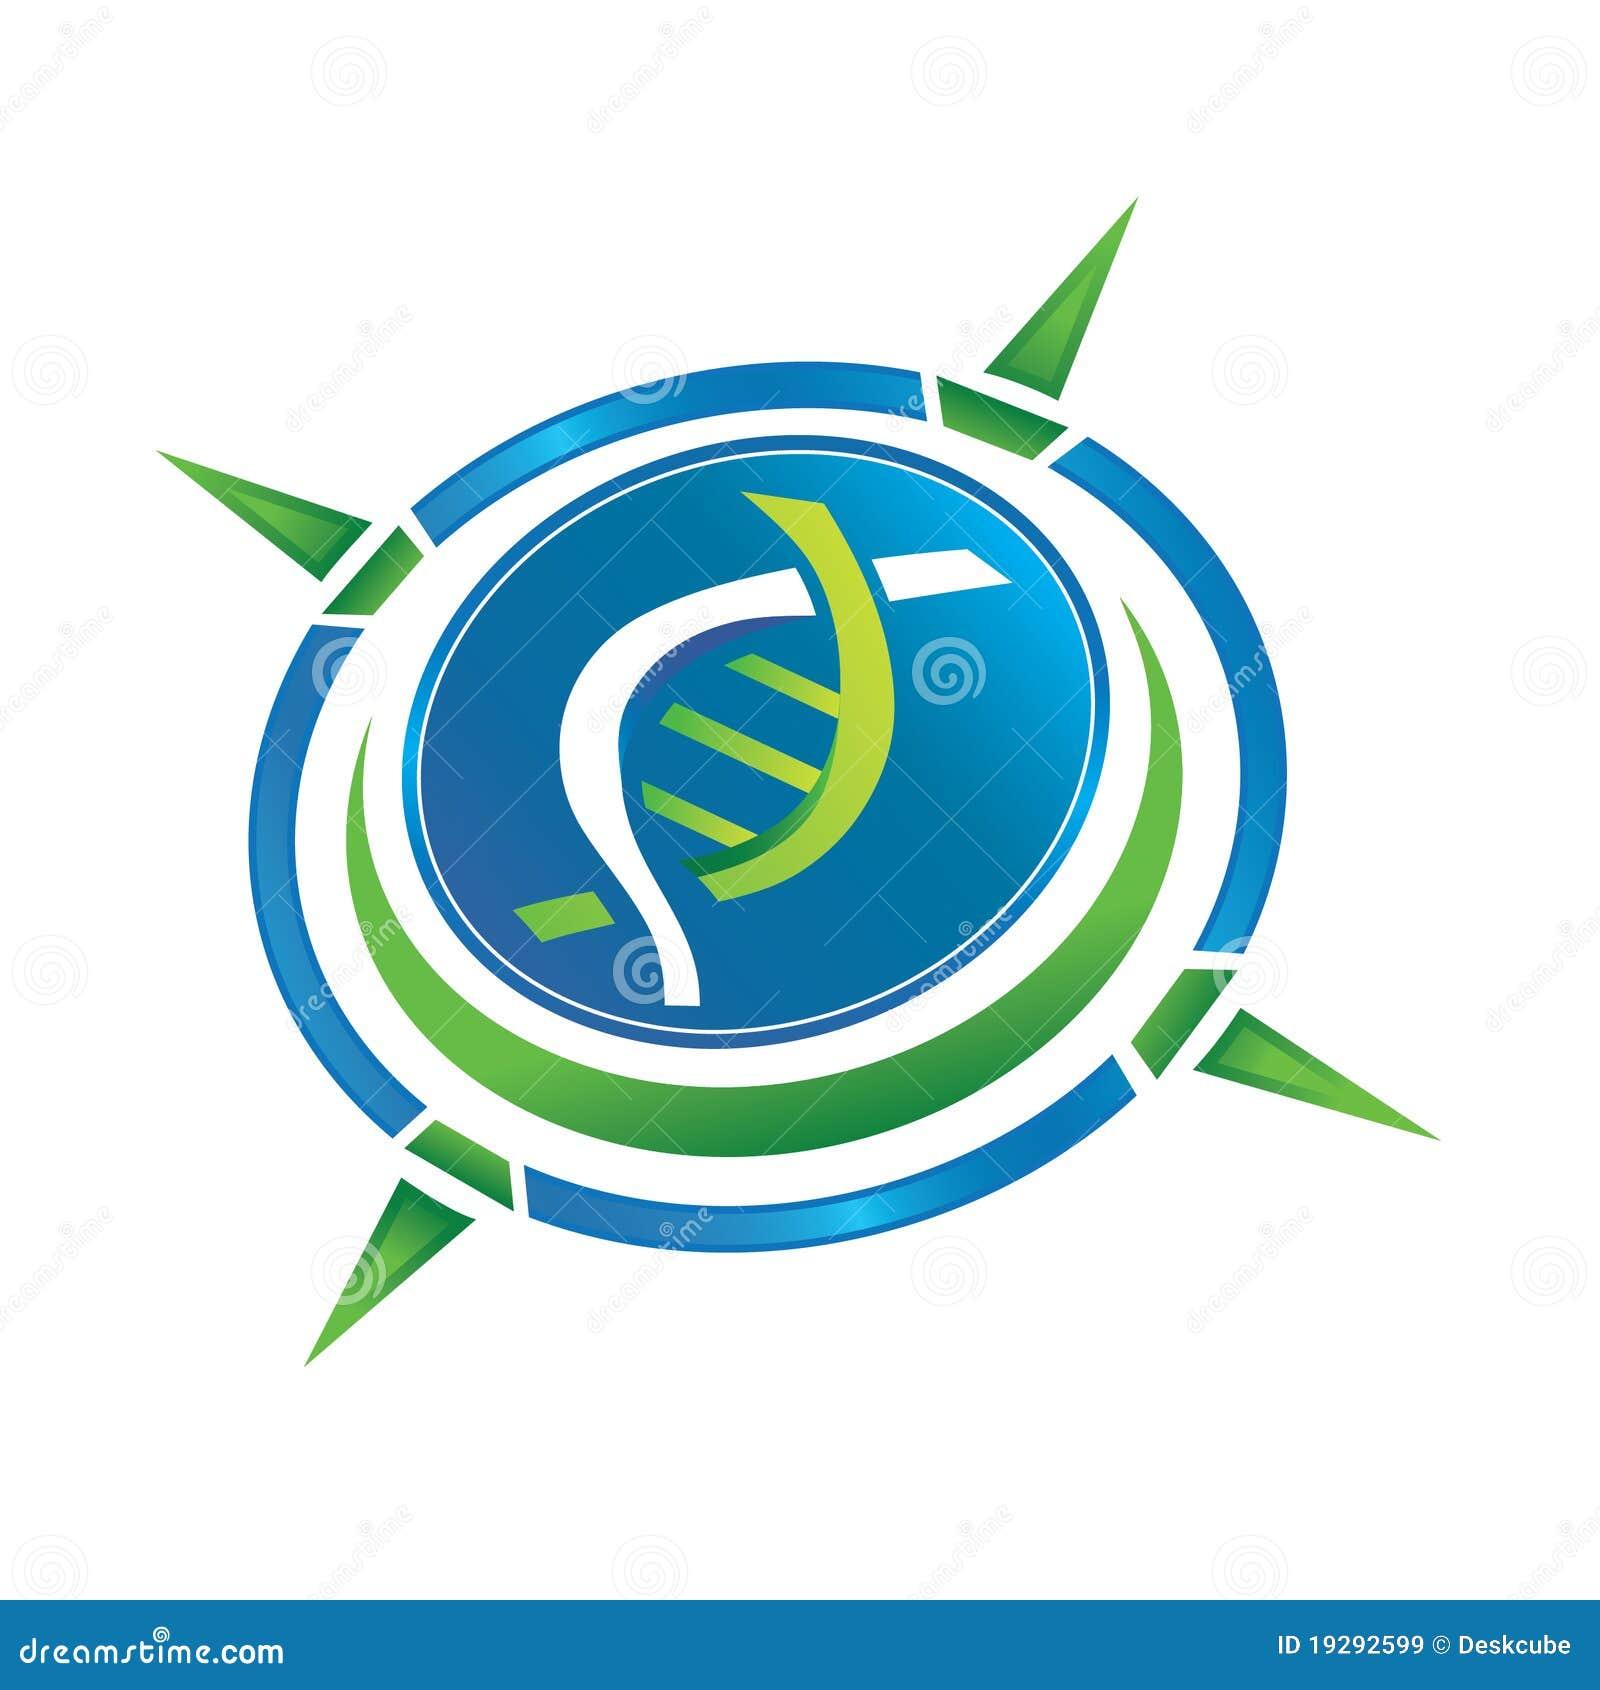 Pharmacy Logo Vector: Compass Logo Stock Vector . Image Of Chemistry, Illness